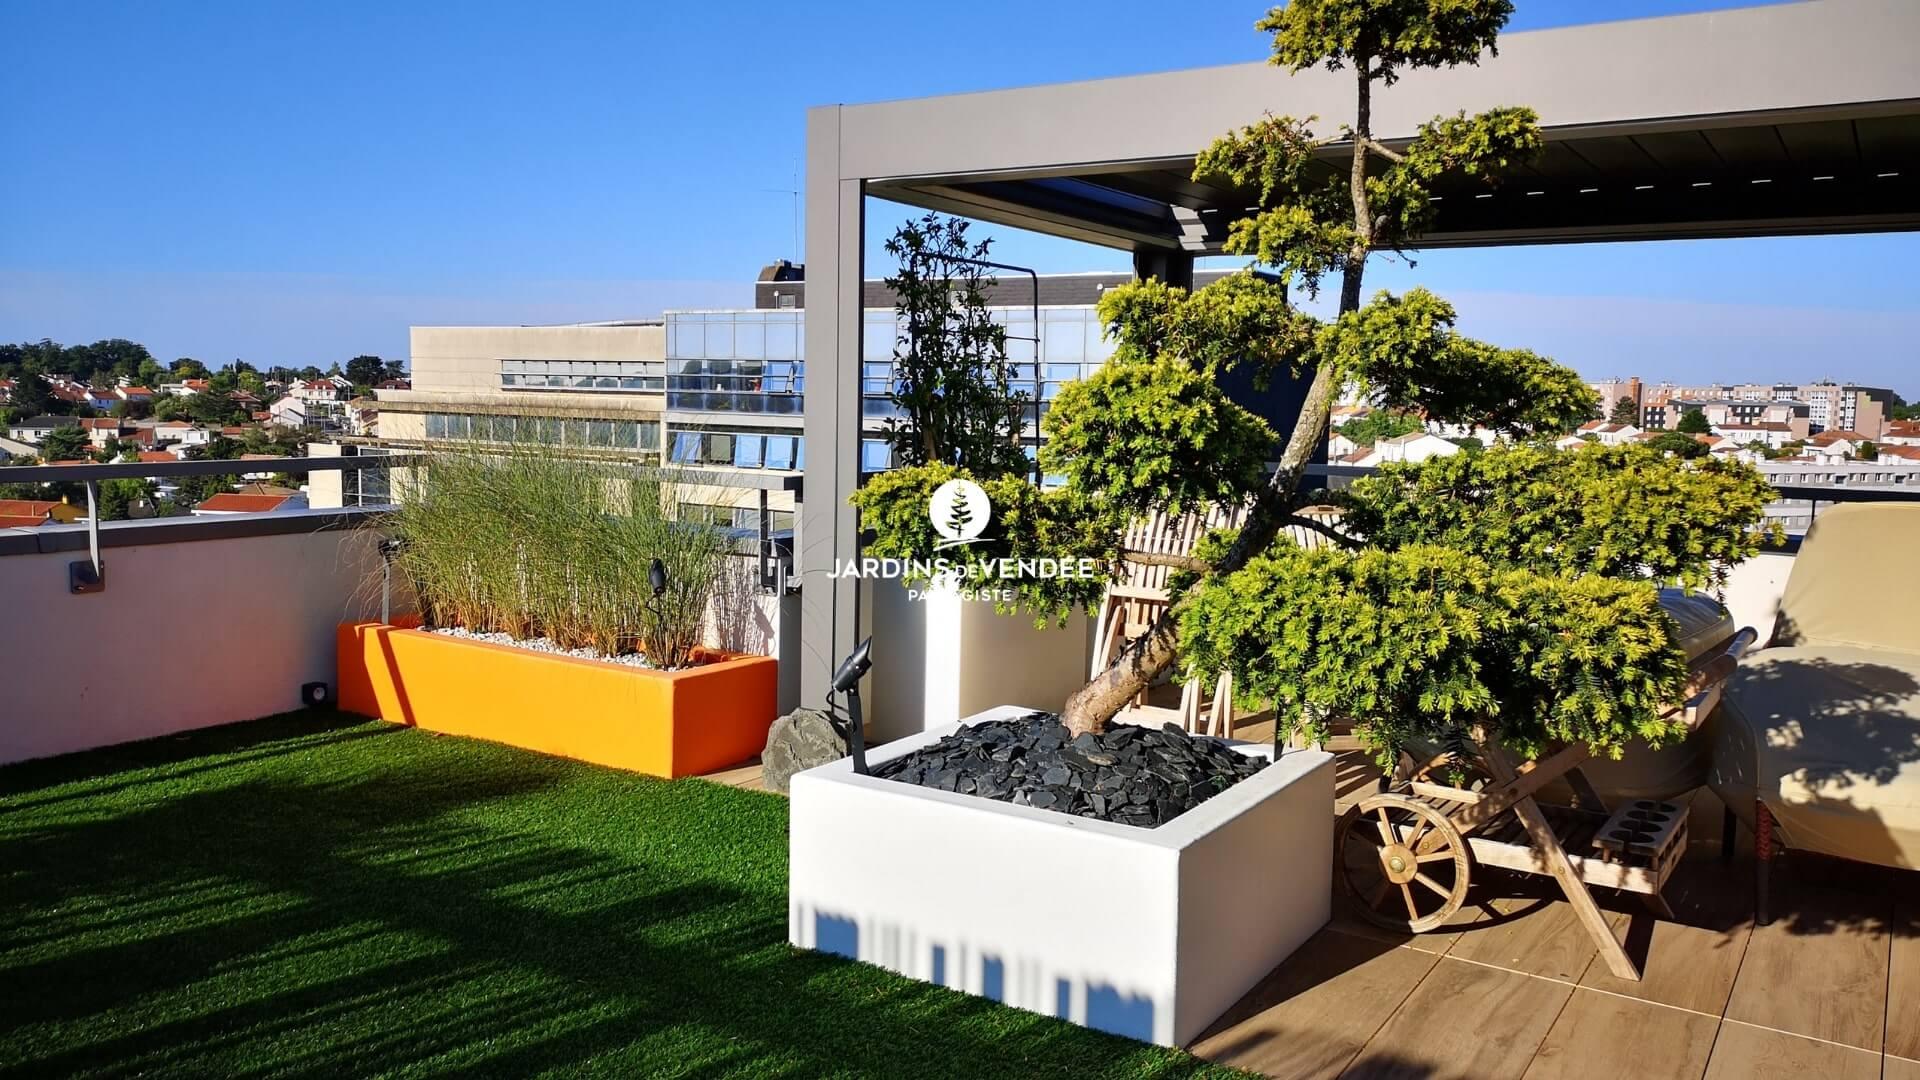 jardinsdevendee-realisations-amenagement-balcon(1)